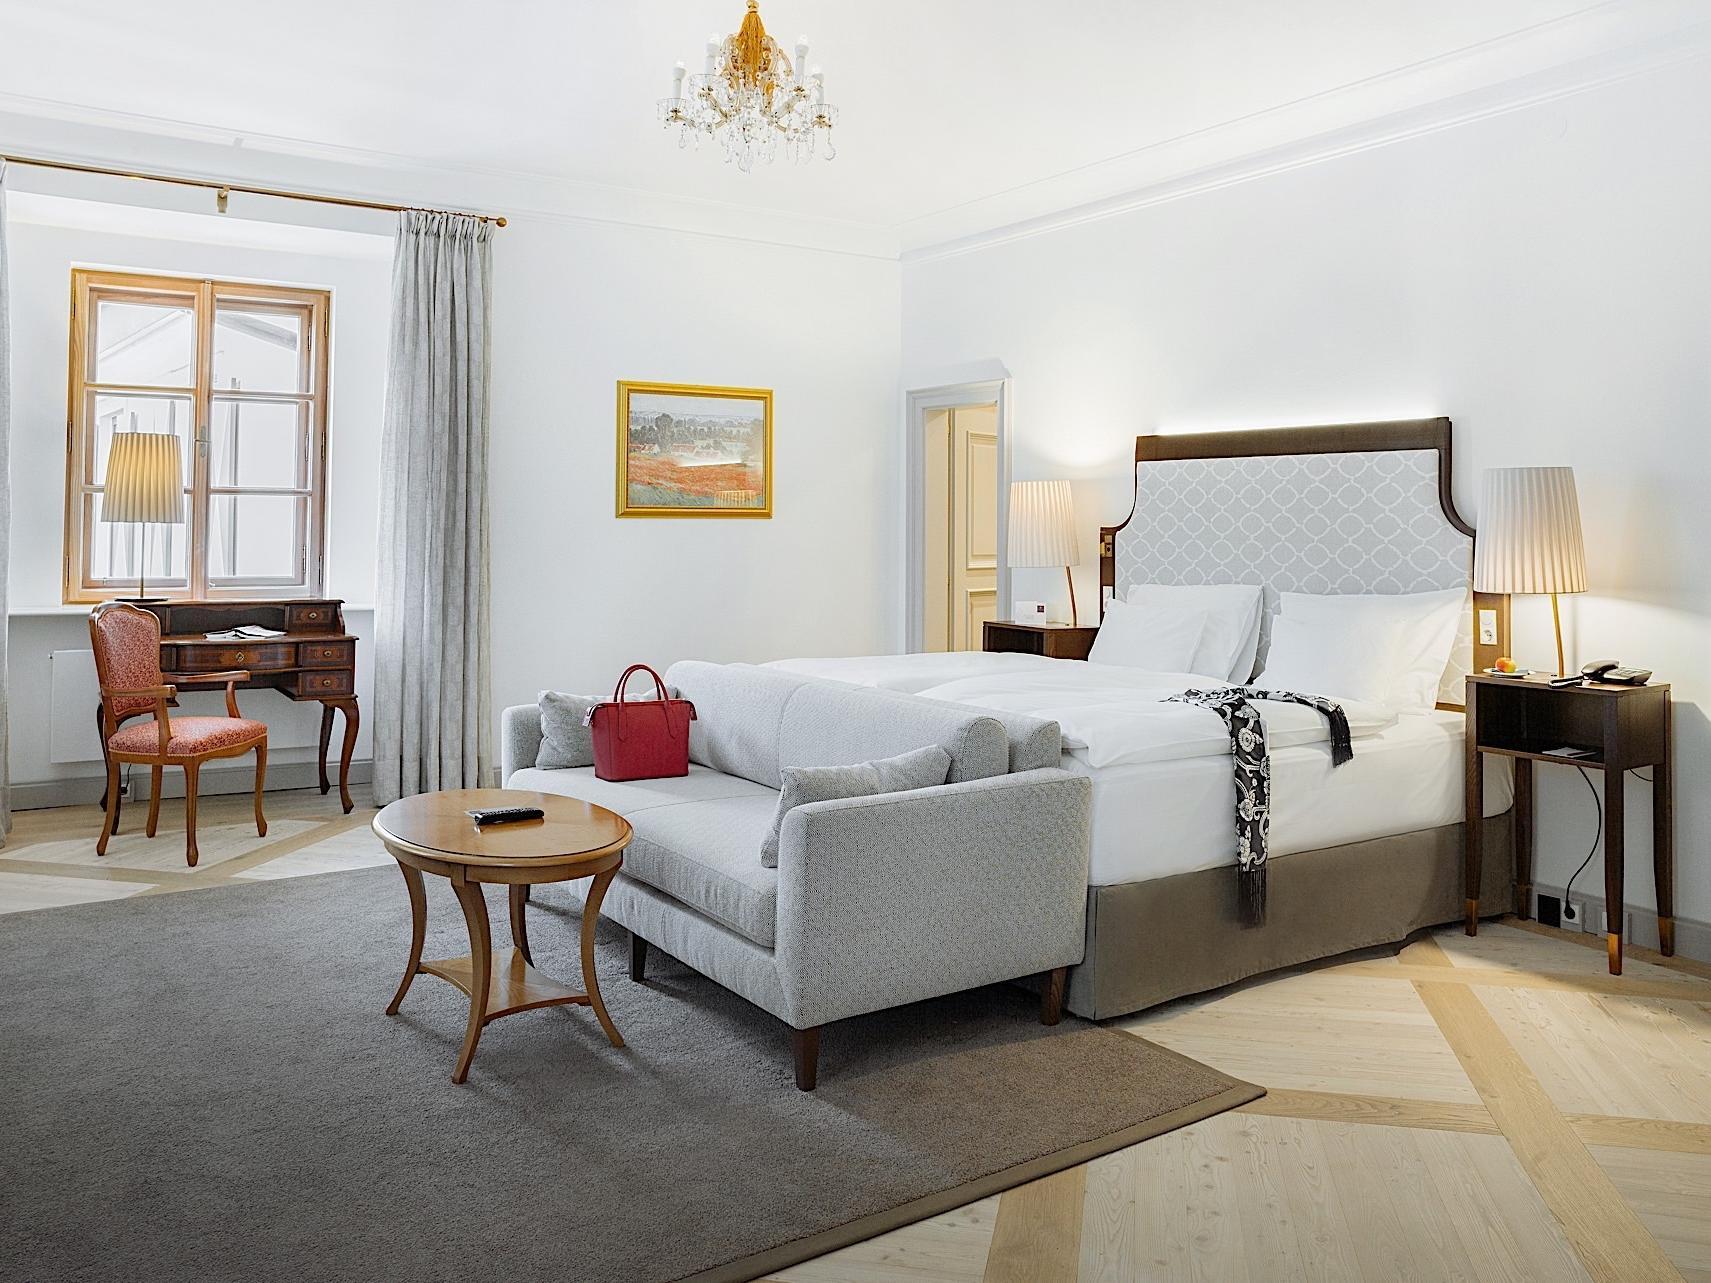 Junior Suite at Romantik Hotel Schloss Pichlarn